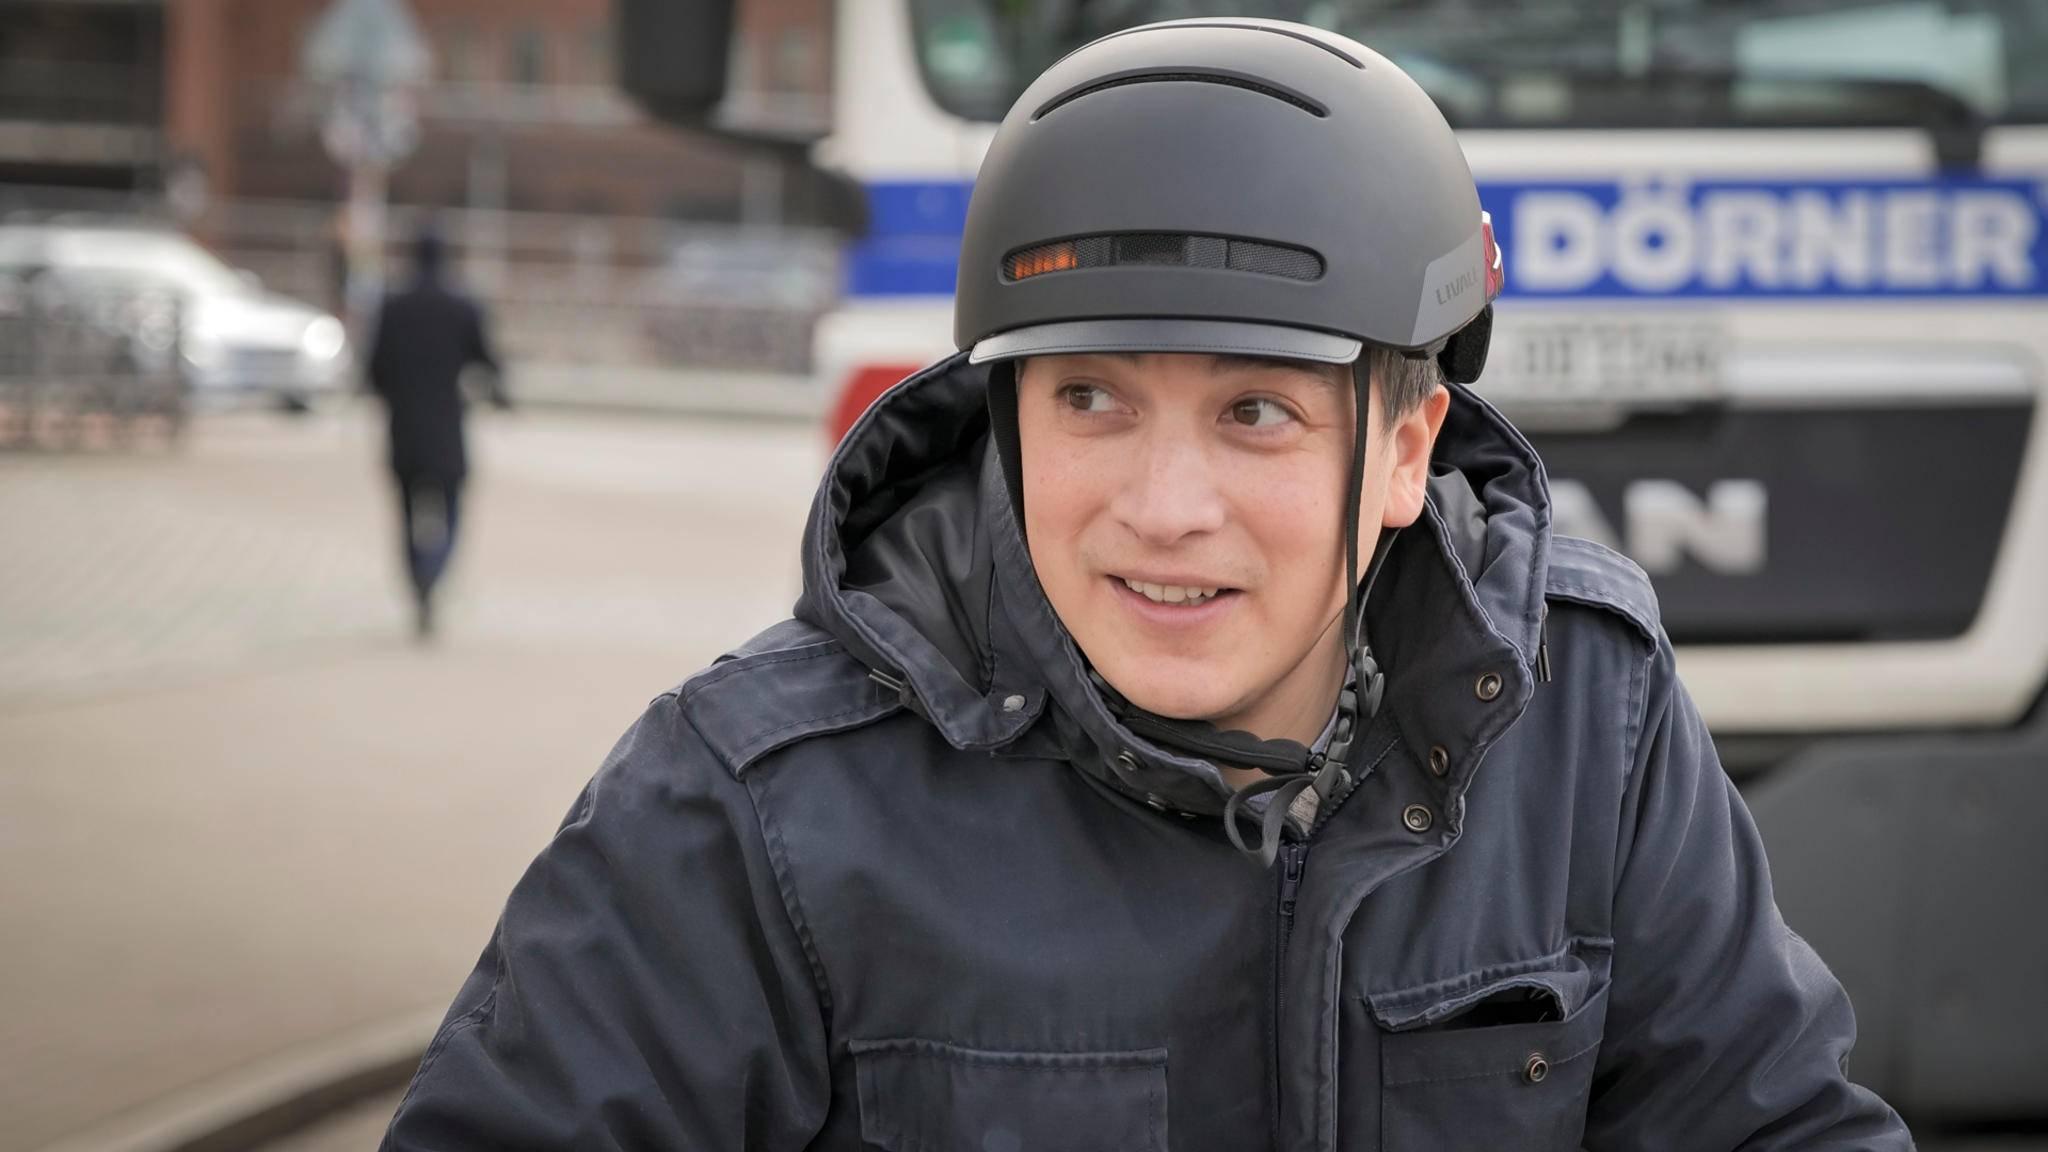 livall-bh-51-fahrrad-helm-test-01